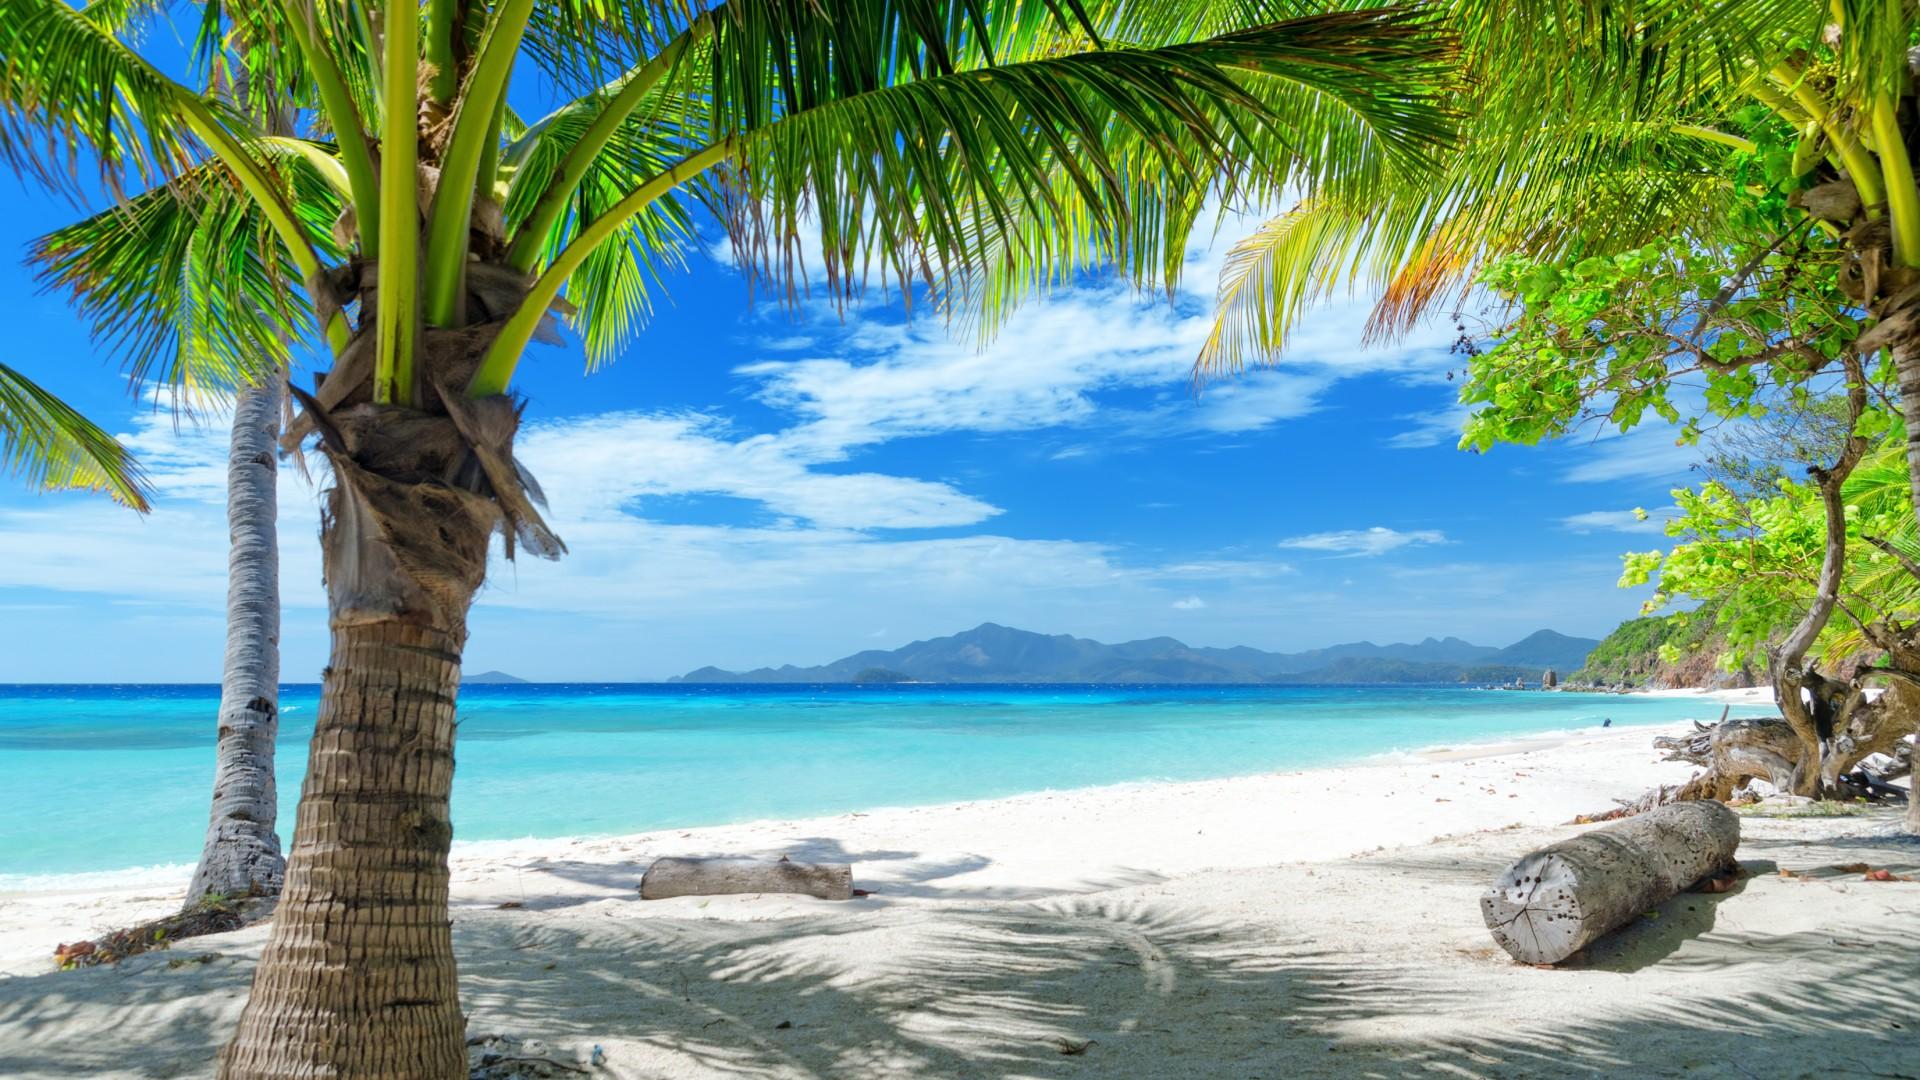 Hd wallpaper beach - Hd Wallpaper Beach Beach Hd Desktop Background Download